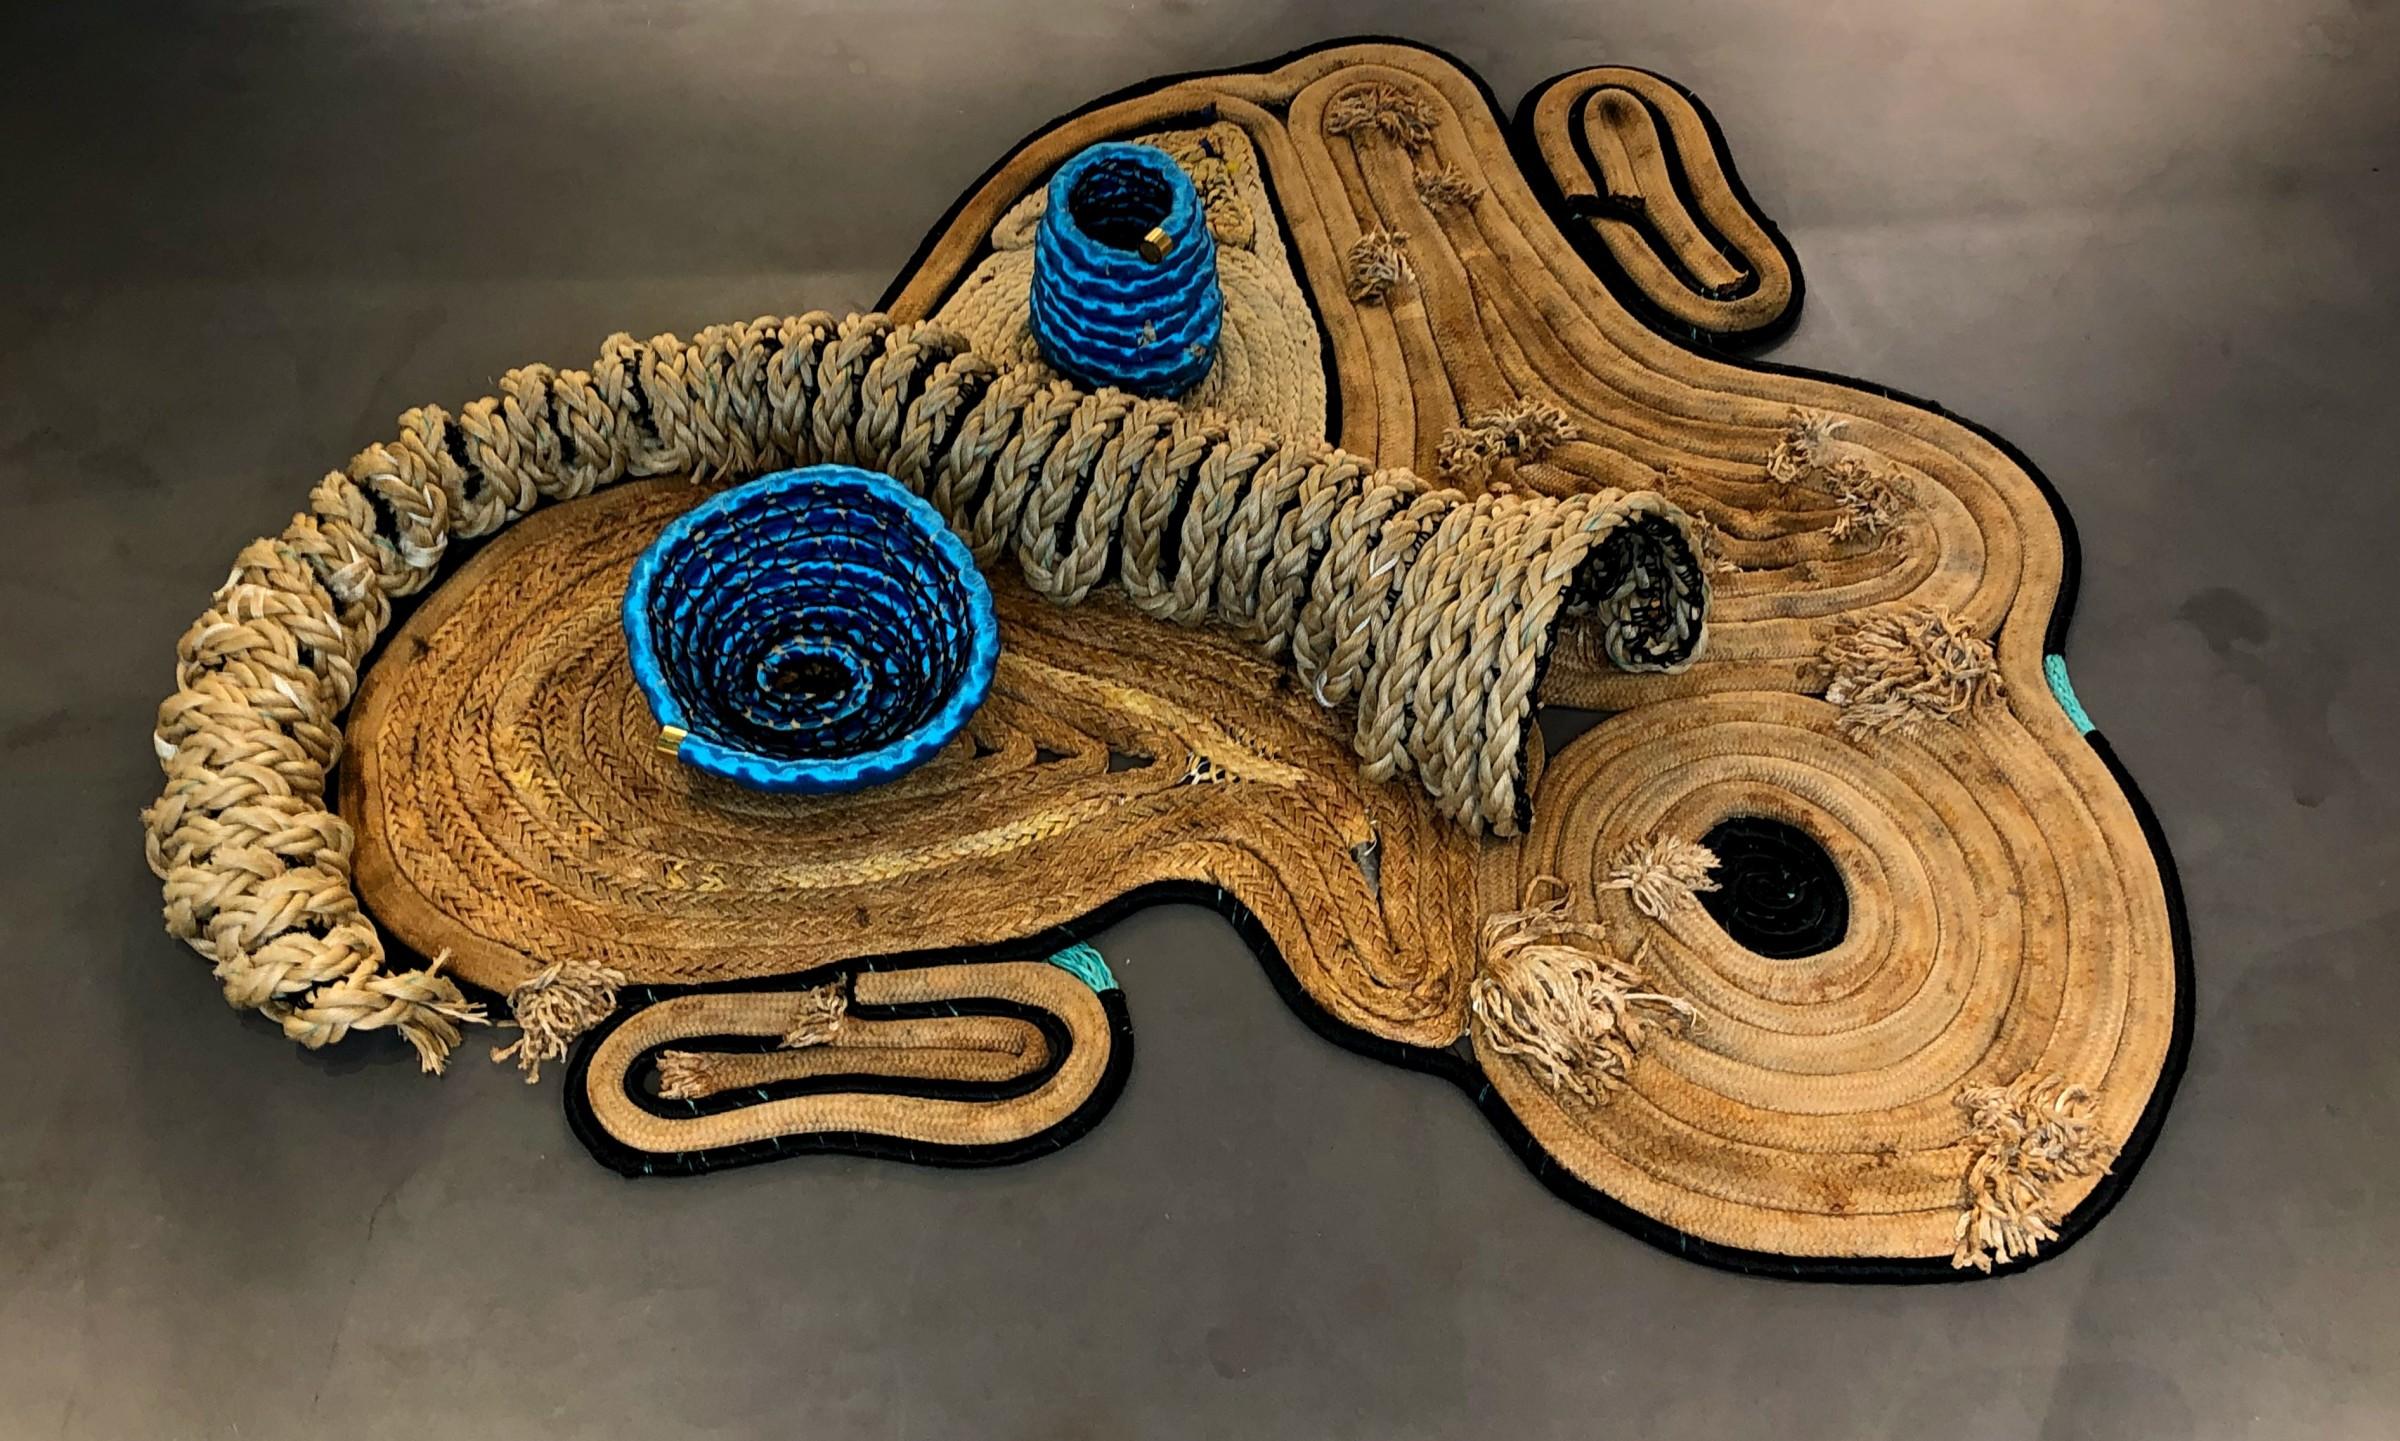 <span class=&#34;link fancybox-details-link&#34;><a href=&#34;/artists/66-joana-schneider/works/5520-joana-schneider-blue-mask-2019/&#34;>View Detail Page</a></span><div class=&#34;artist&#34;><strong>Joana Schneider</strong></div> <div class=&#34;title&#34;><em>Blue Mask</em>, 2019</div> <div class=&#34;medium&#34;>Recycled Ropes</div> <div class=&#34;dimensions&#34;>310 x 290 cm<br /> 122 1/8 x 114 1/8 in</div>